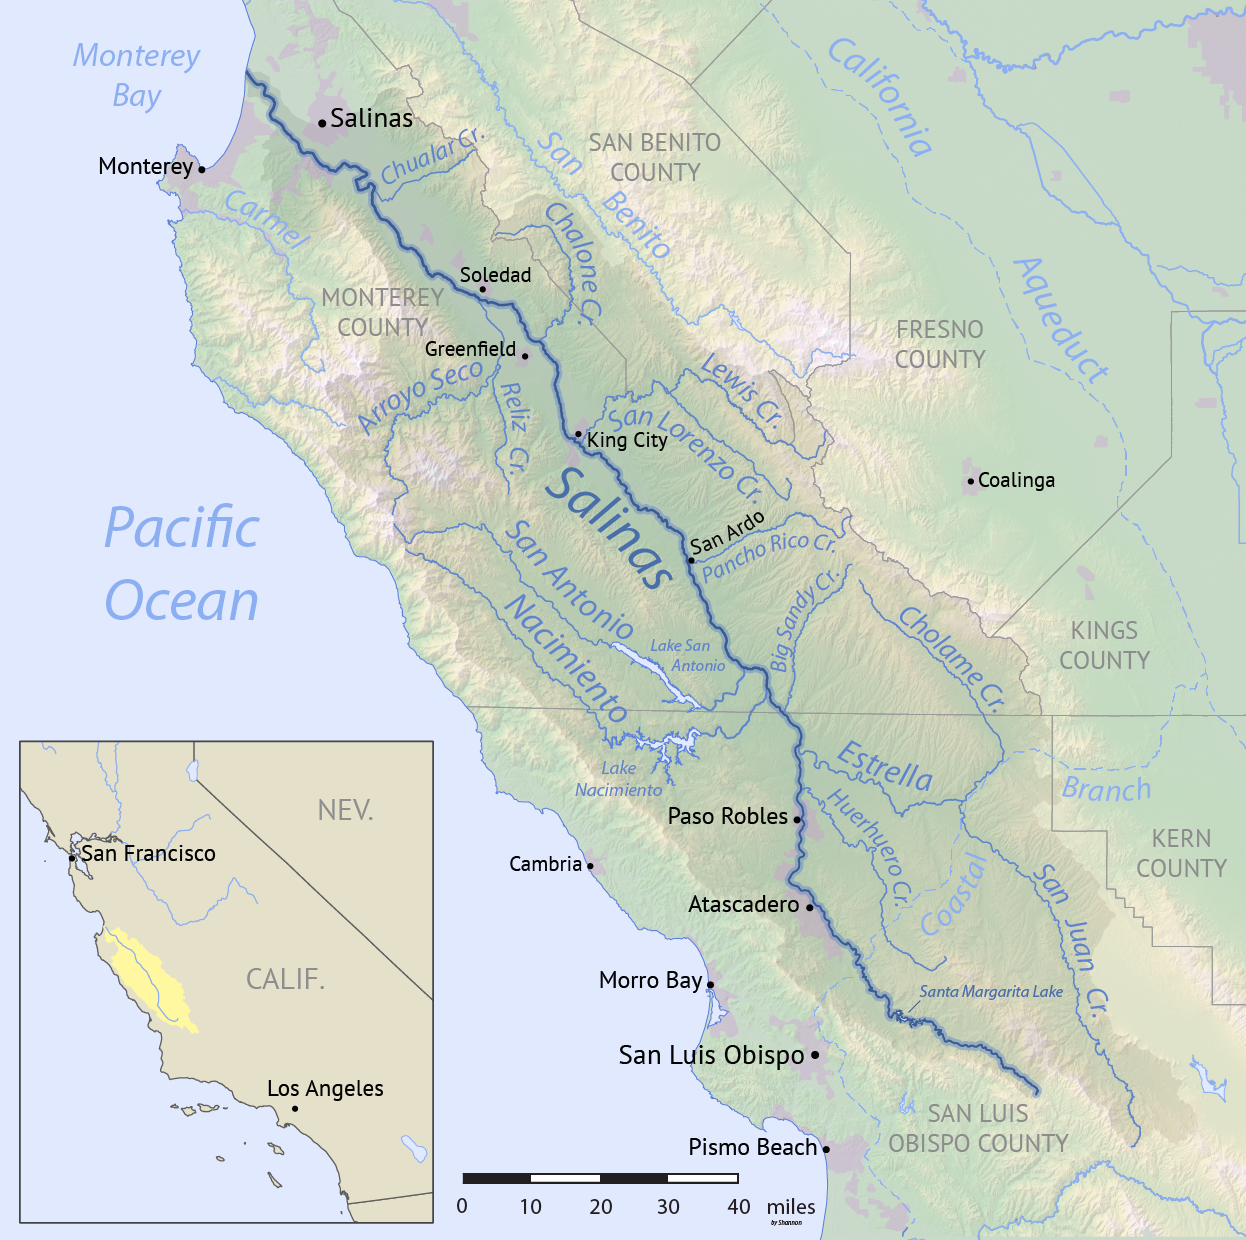 Salinas California Map Salinas Valley   Wikipedia Salinas California Map